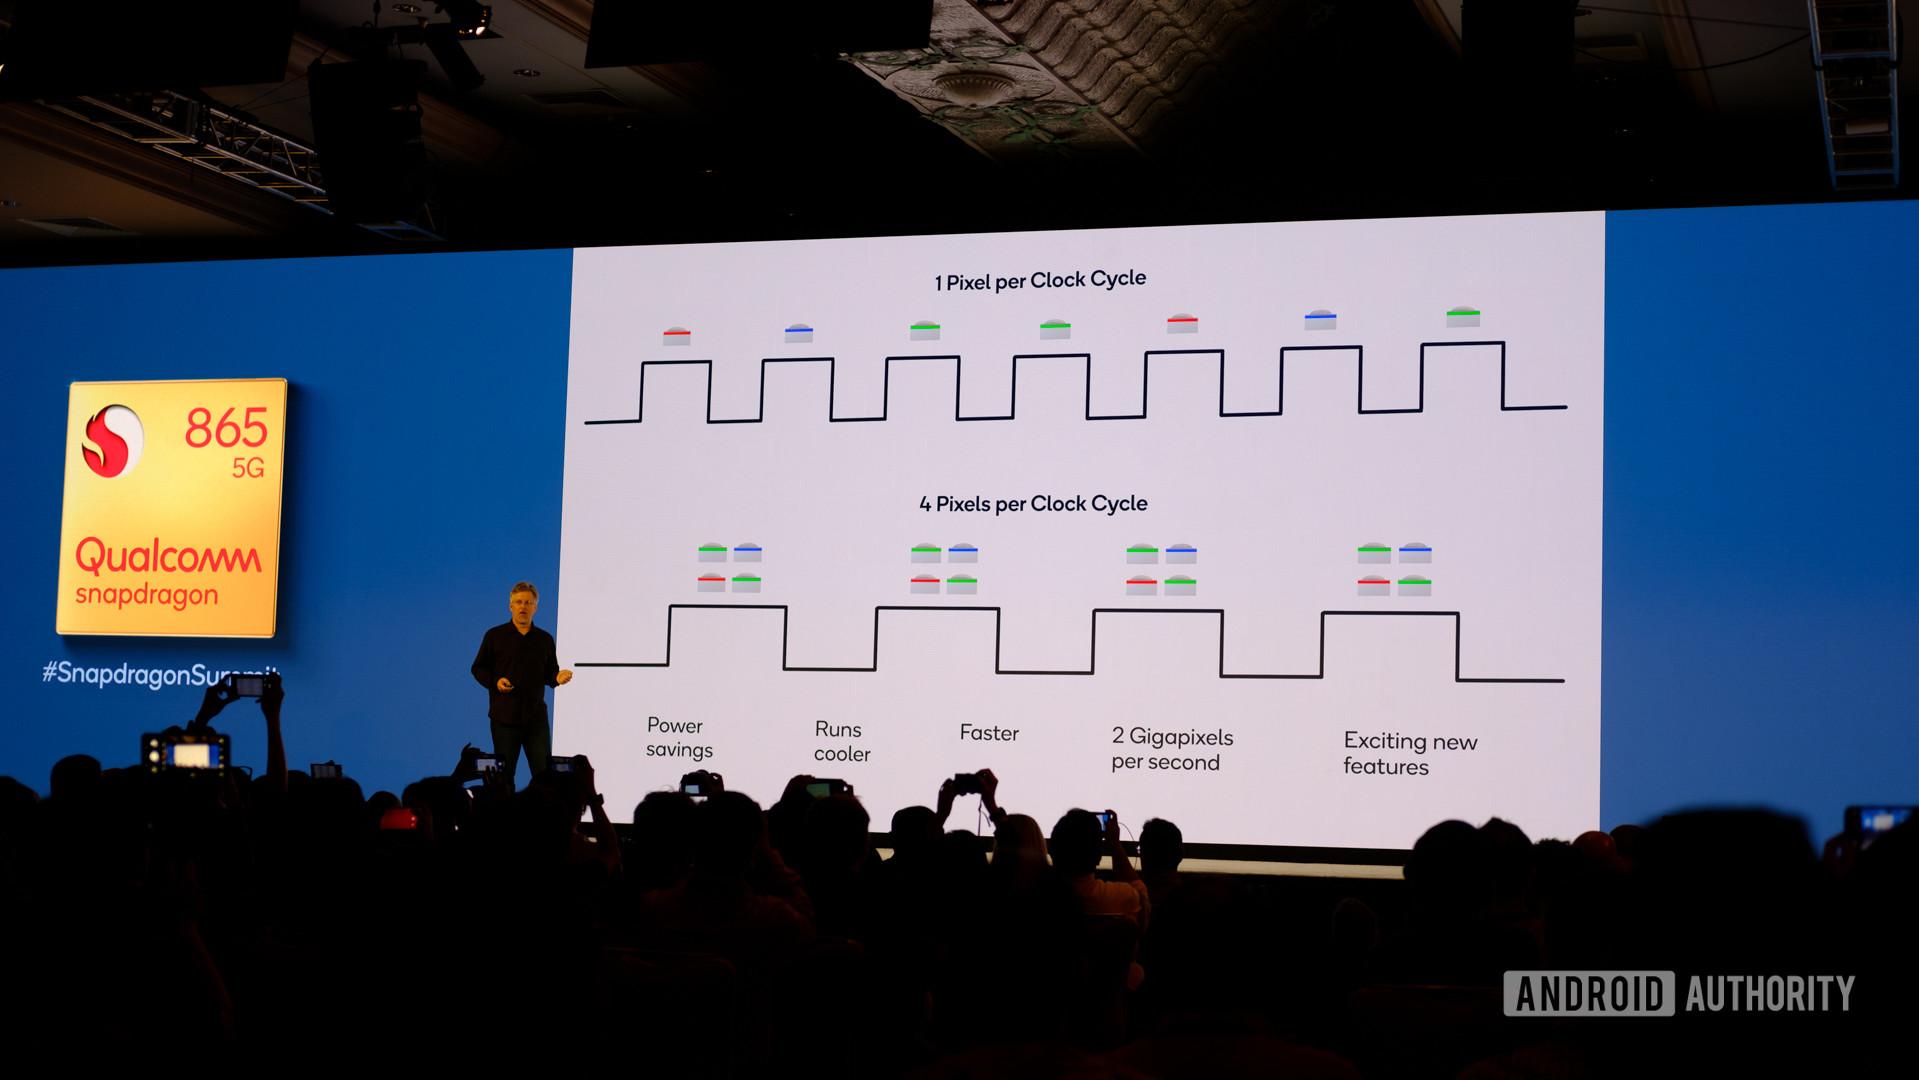 Qualcomm Snapdragon 865 dropped clock rate slides